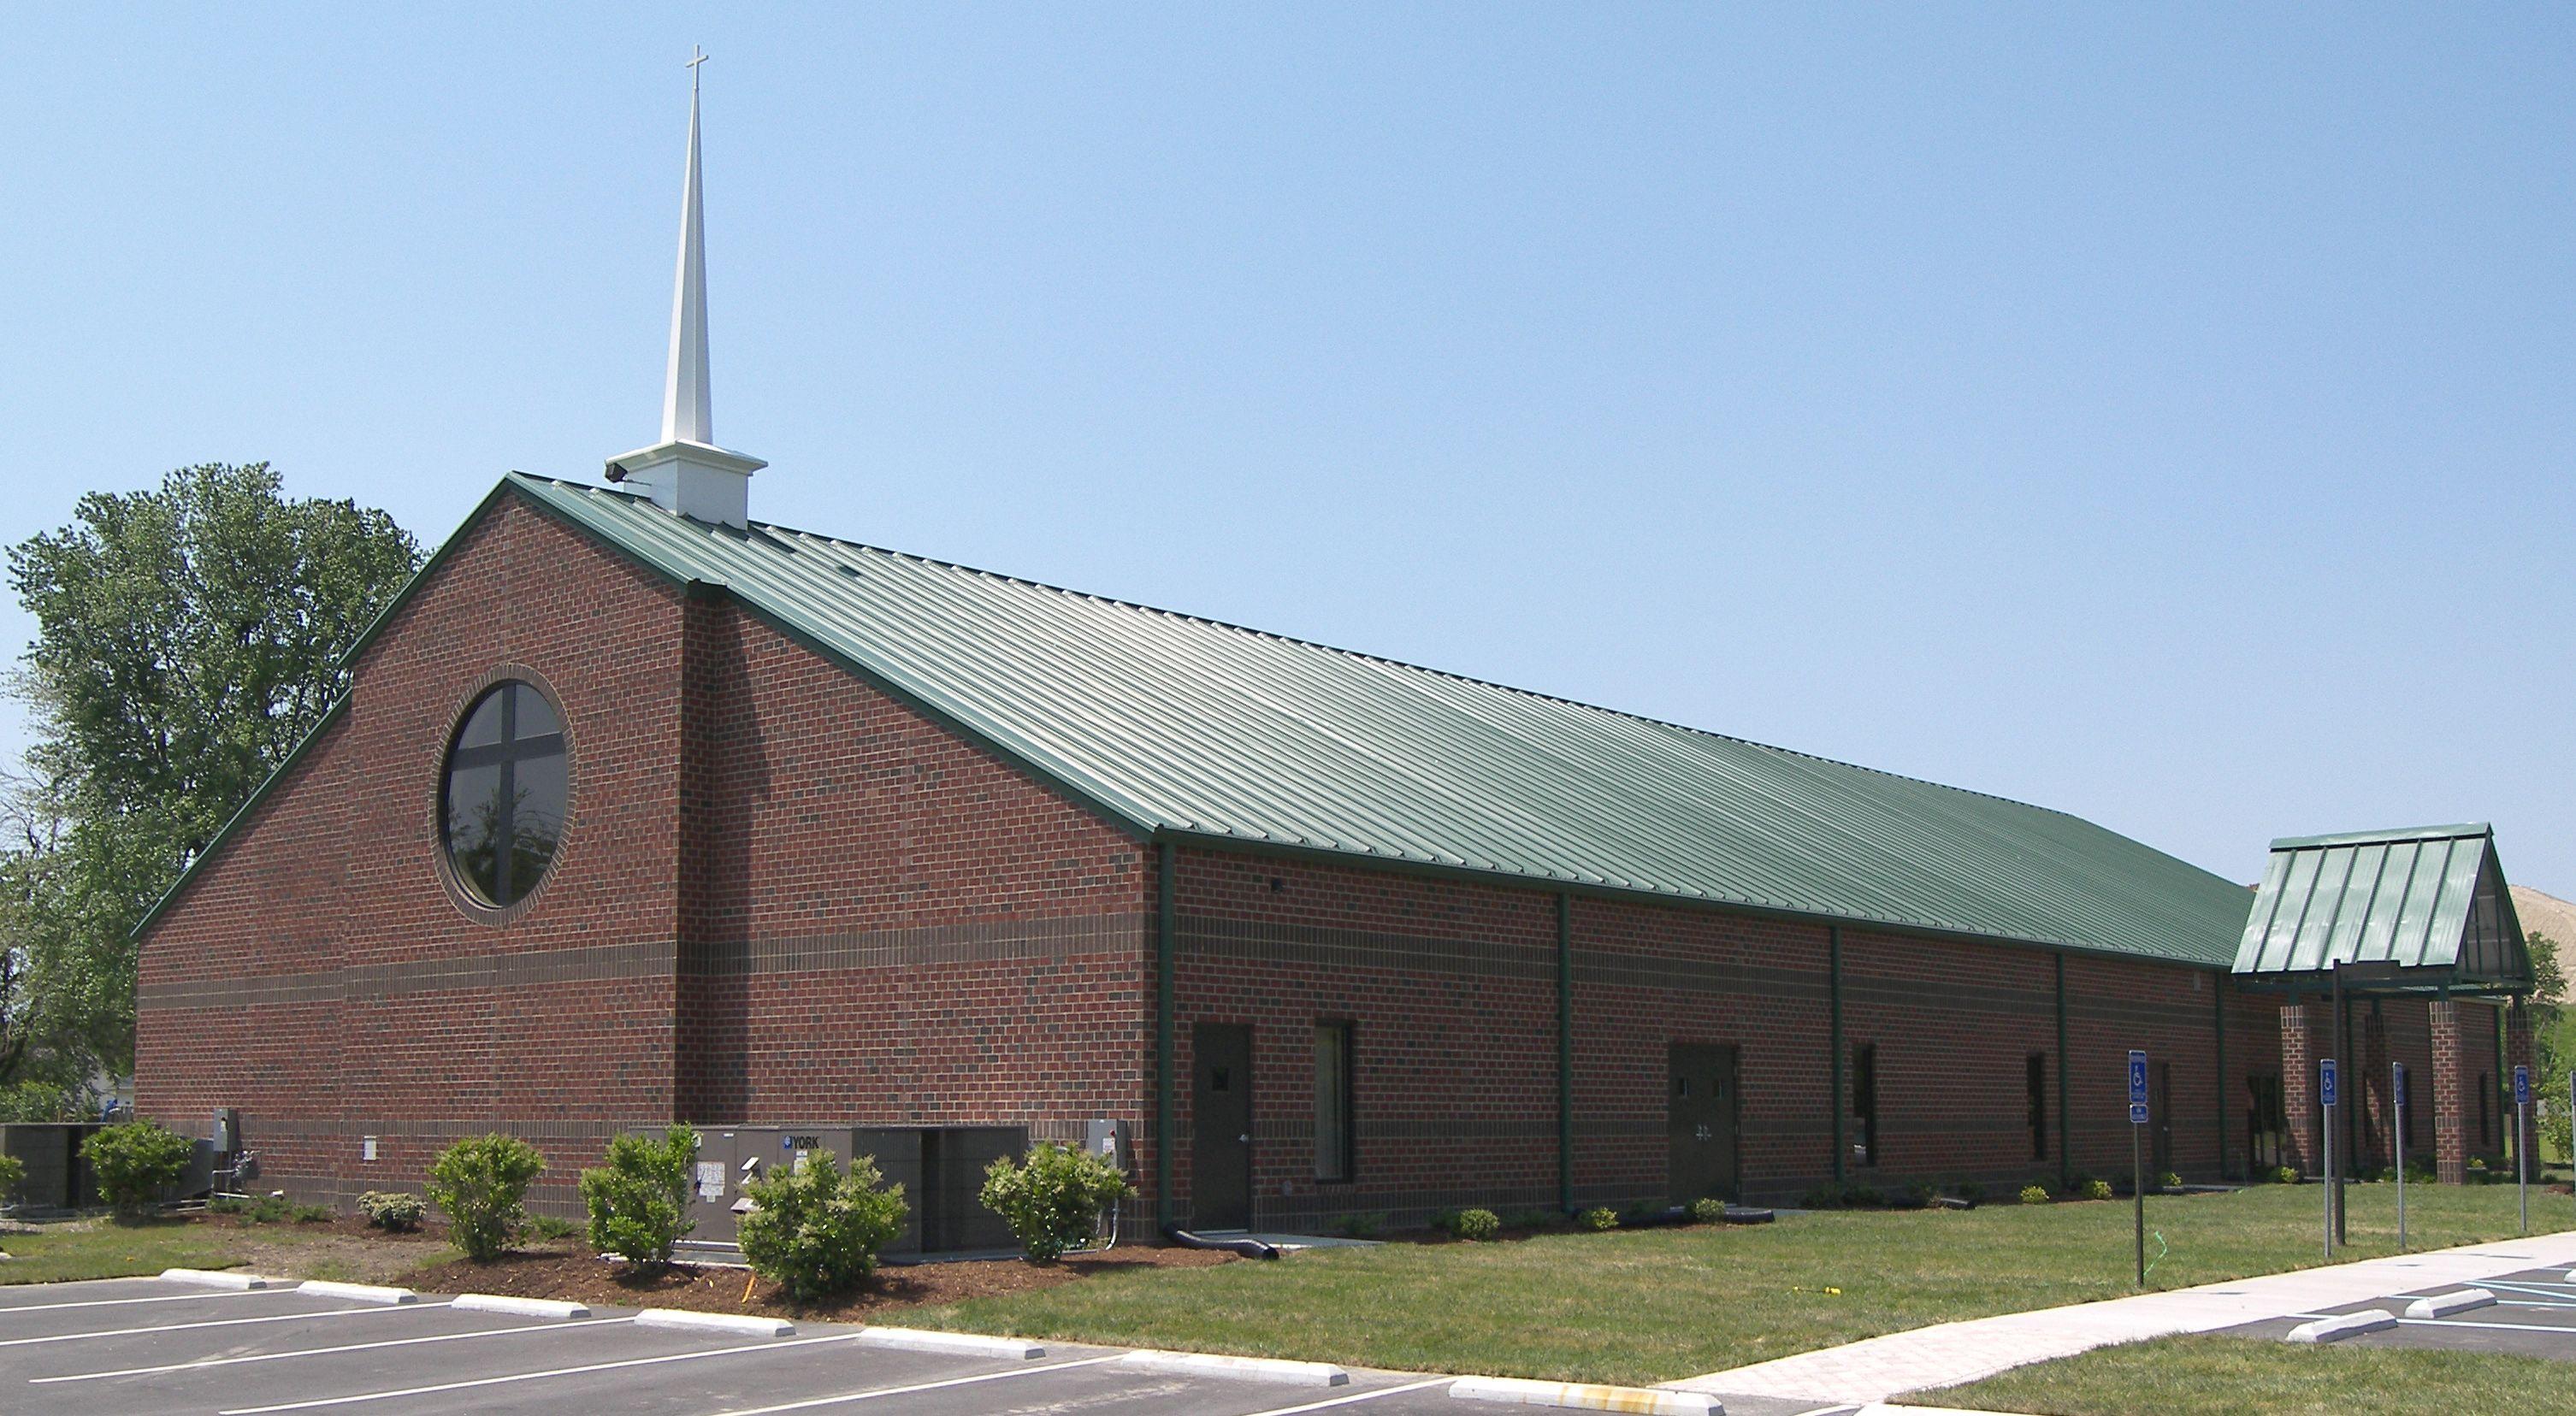 New Hope Baptist Church Exterior Churches Newport News